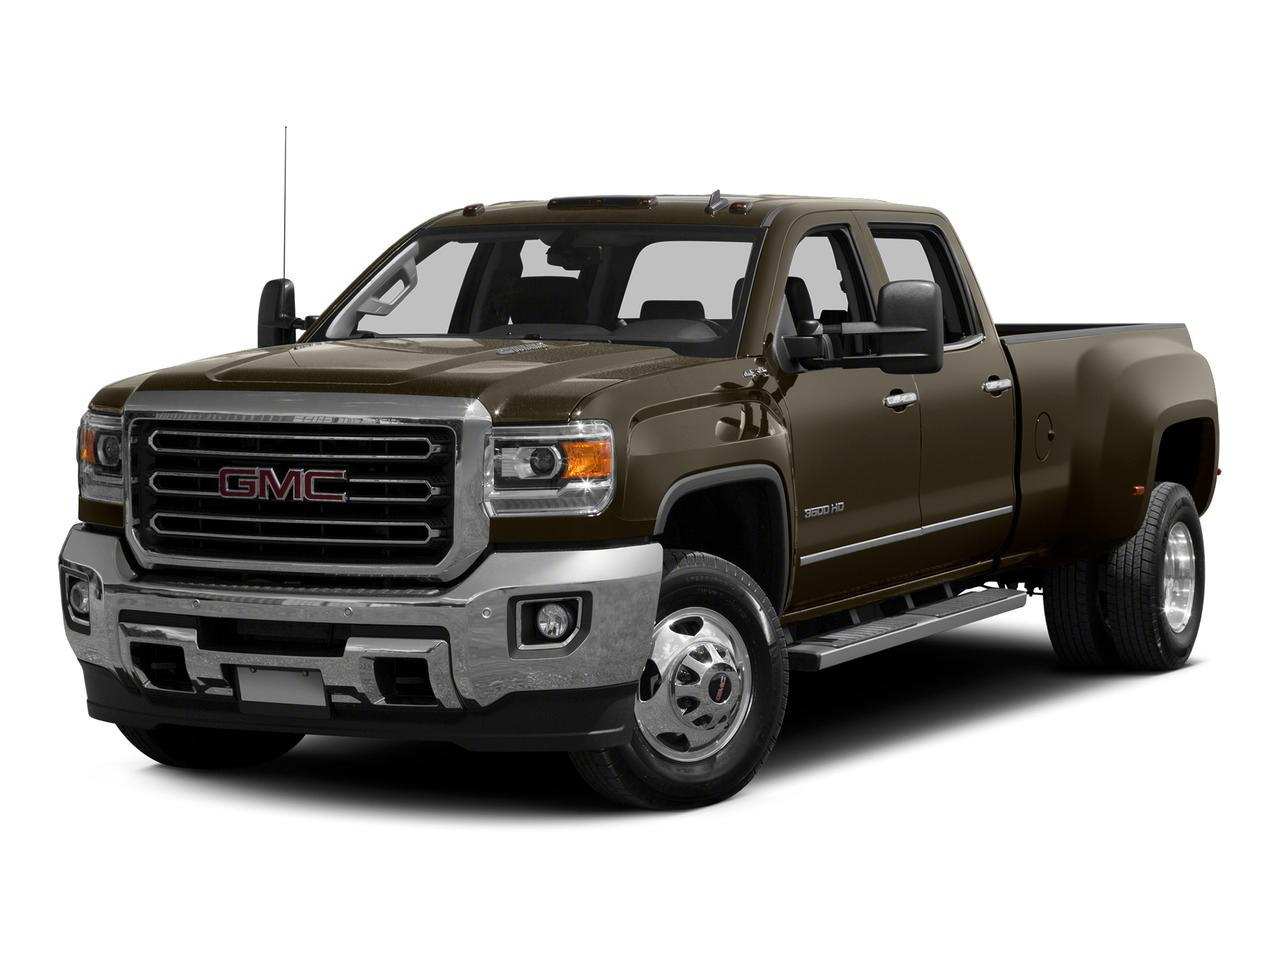 2015 GMC Sierra 3500HD available WiFi Vehicle Photo in Prescott, AZ 86305